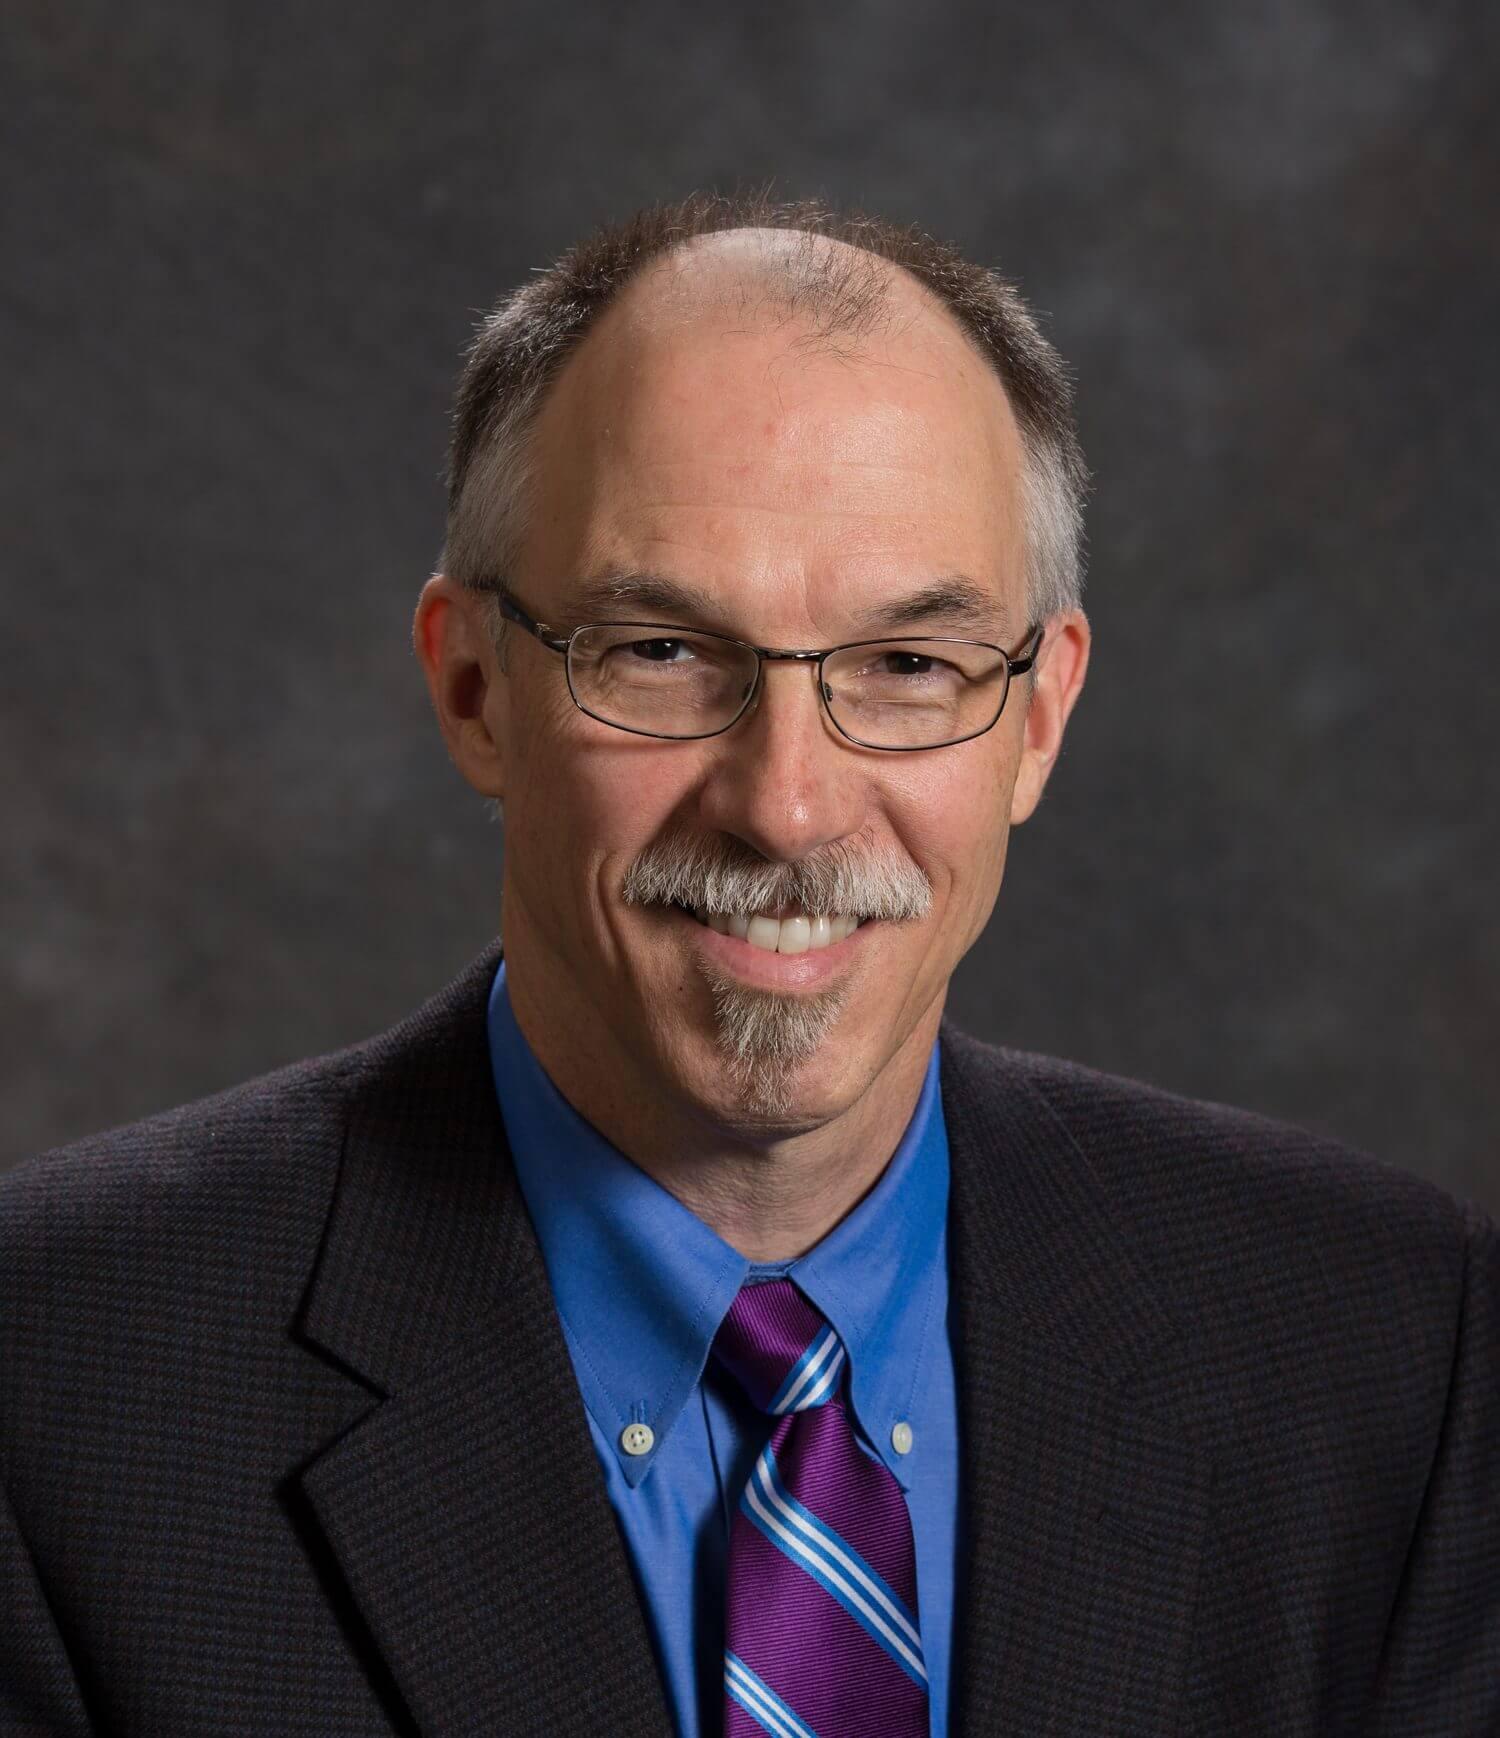 Dr. Timothy G. Herring